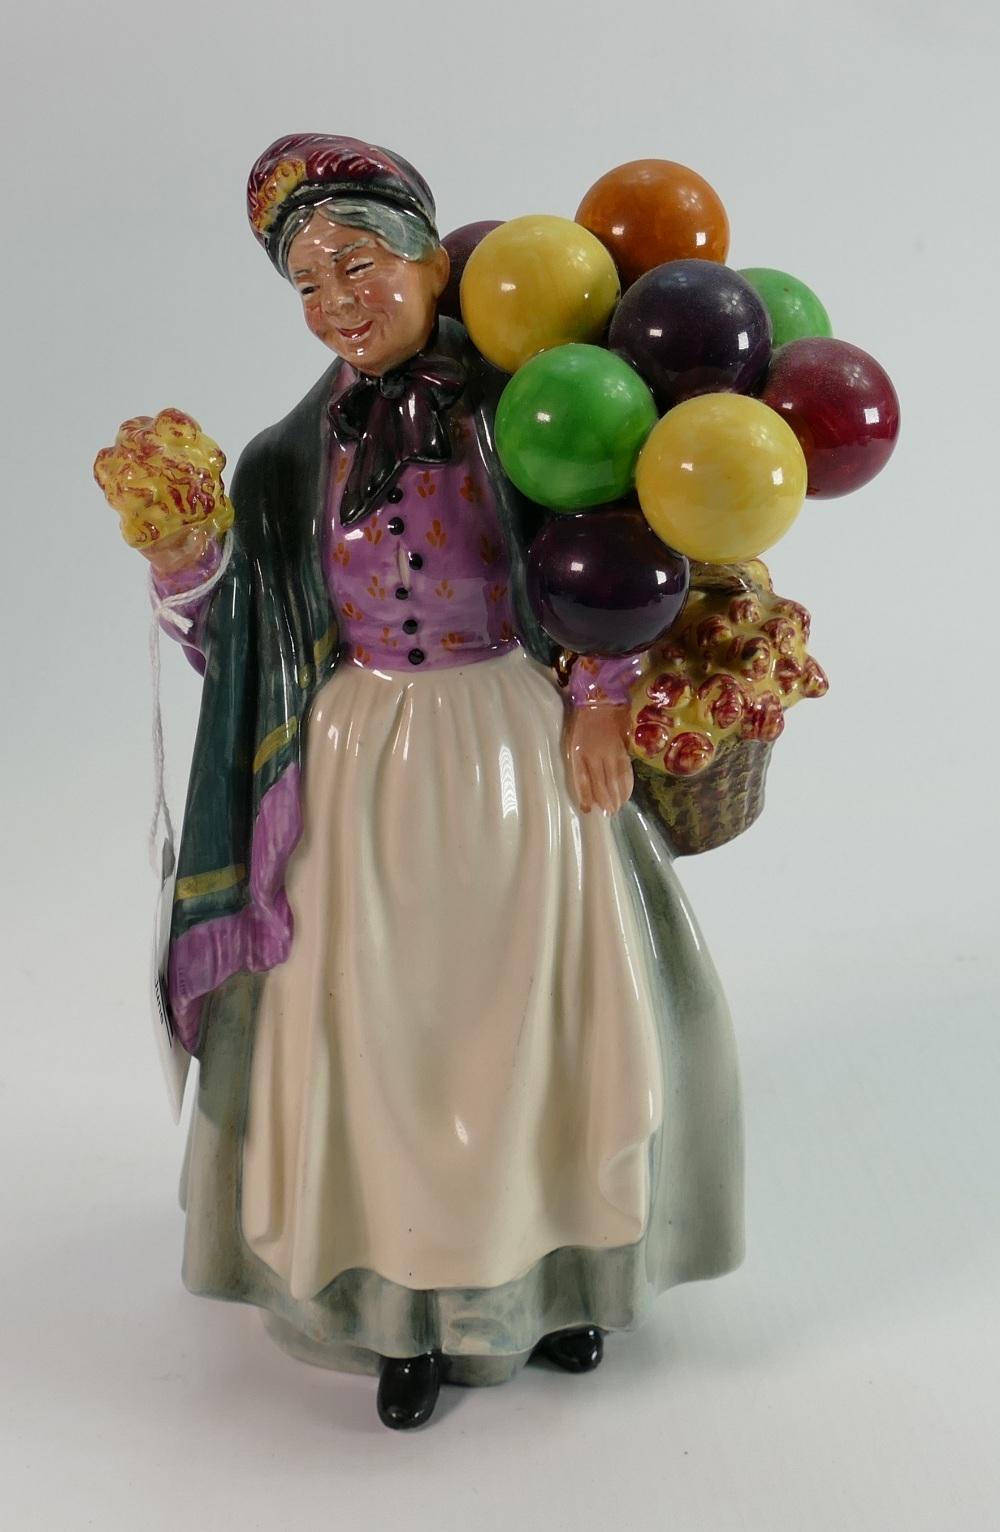 Royal Doulton figure Biddy Penny Farthing HN 1843: An earlier example.